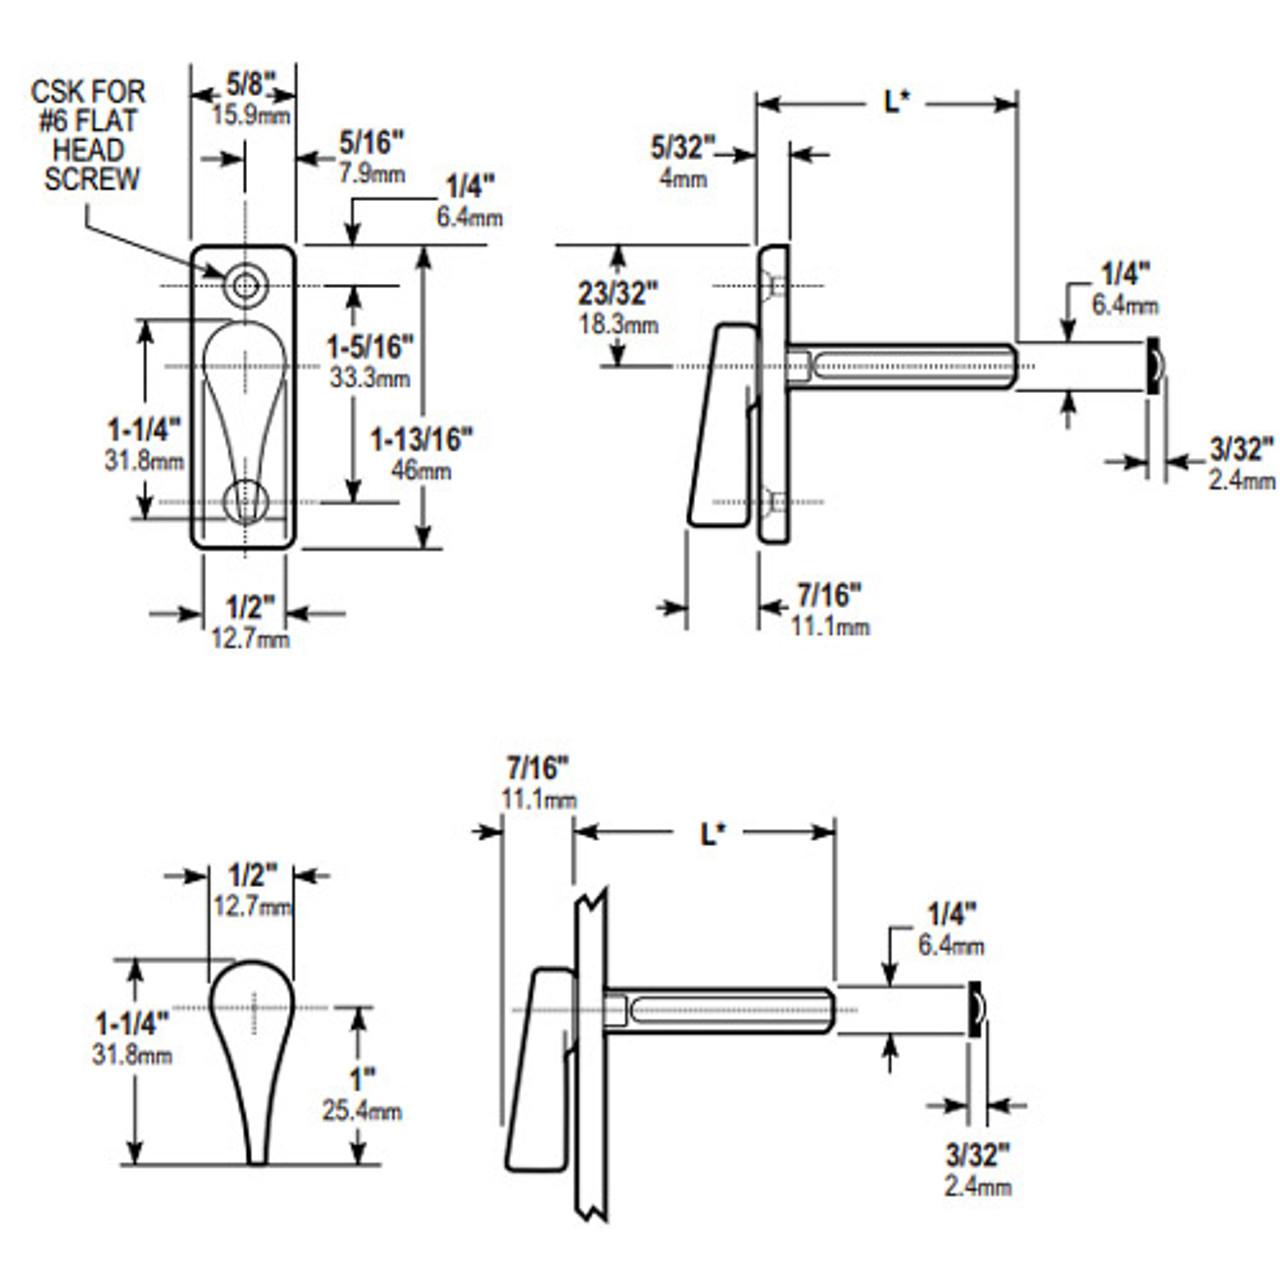 1000-11-13-130 Adams Rite 1000 Series Turns Dimensional View